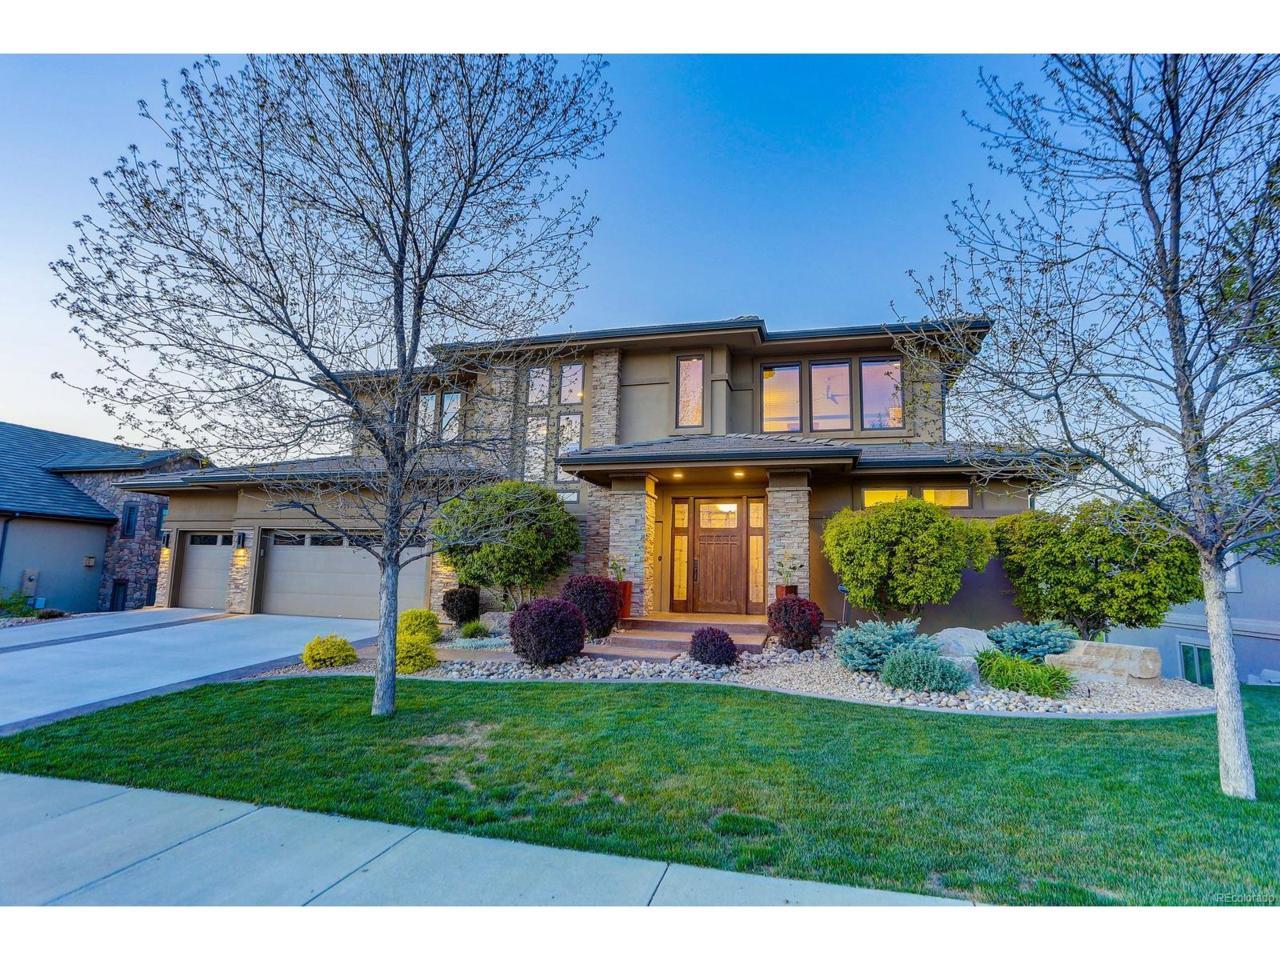 5535 Cedar Valley Drive, Loveland, CO 80537 (MLS #3968500) :: 8z Real Estate